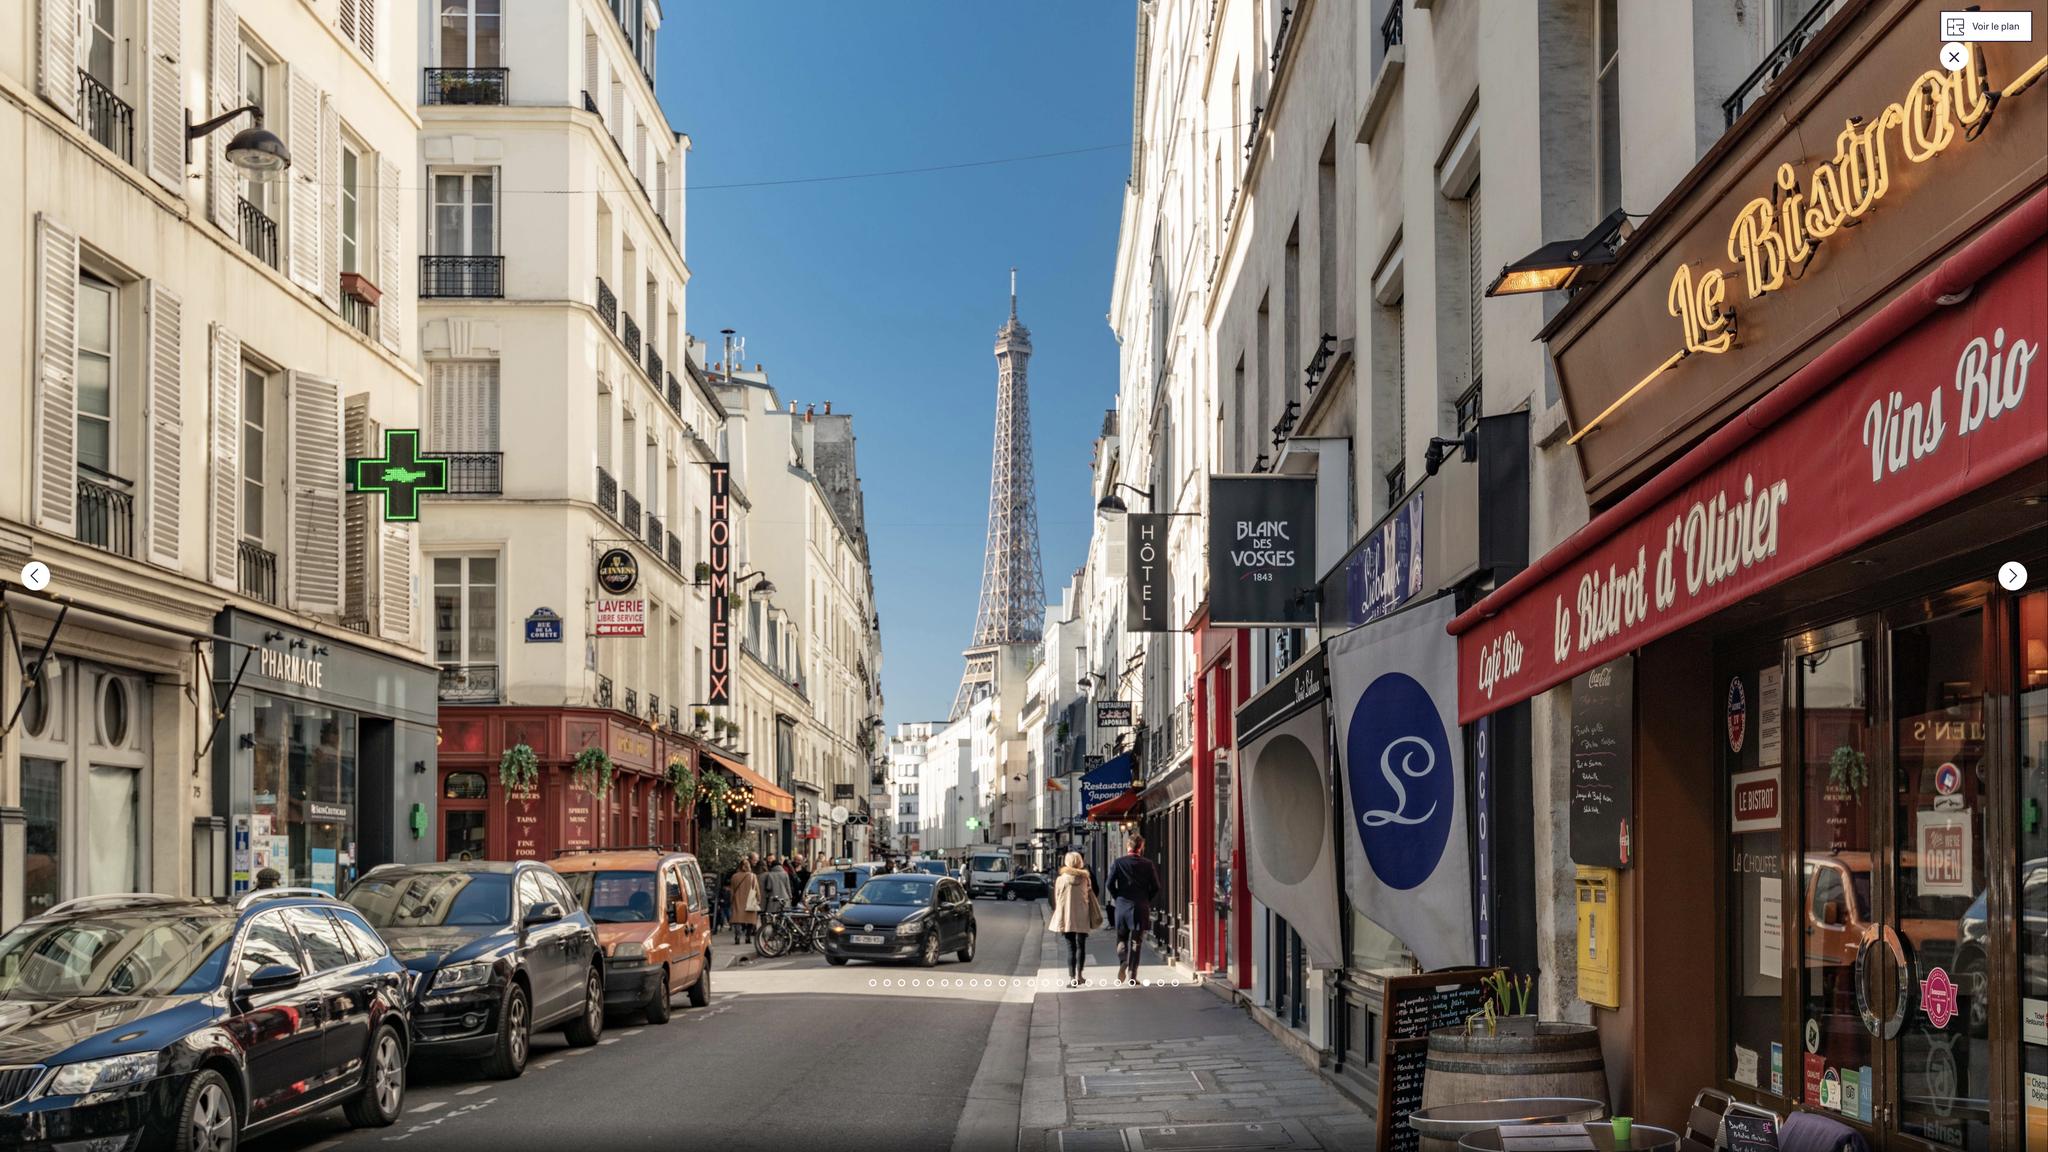 ©Laurent Danquigny photographe/©The Plum Guide Mars 2019